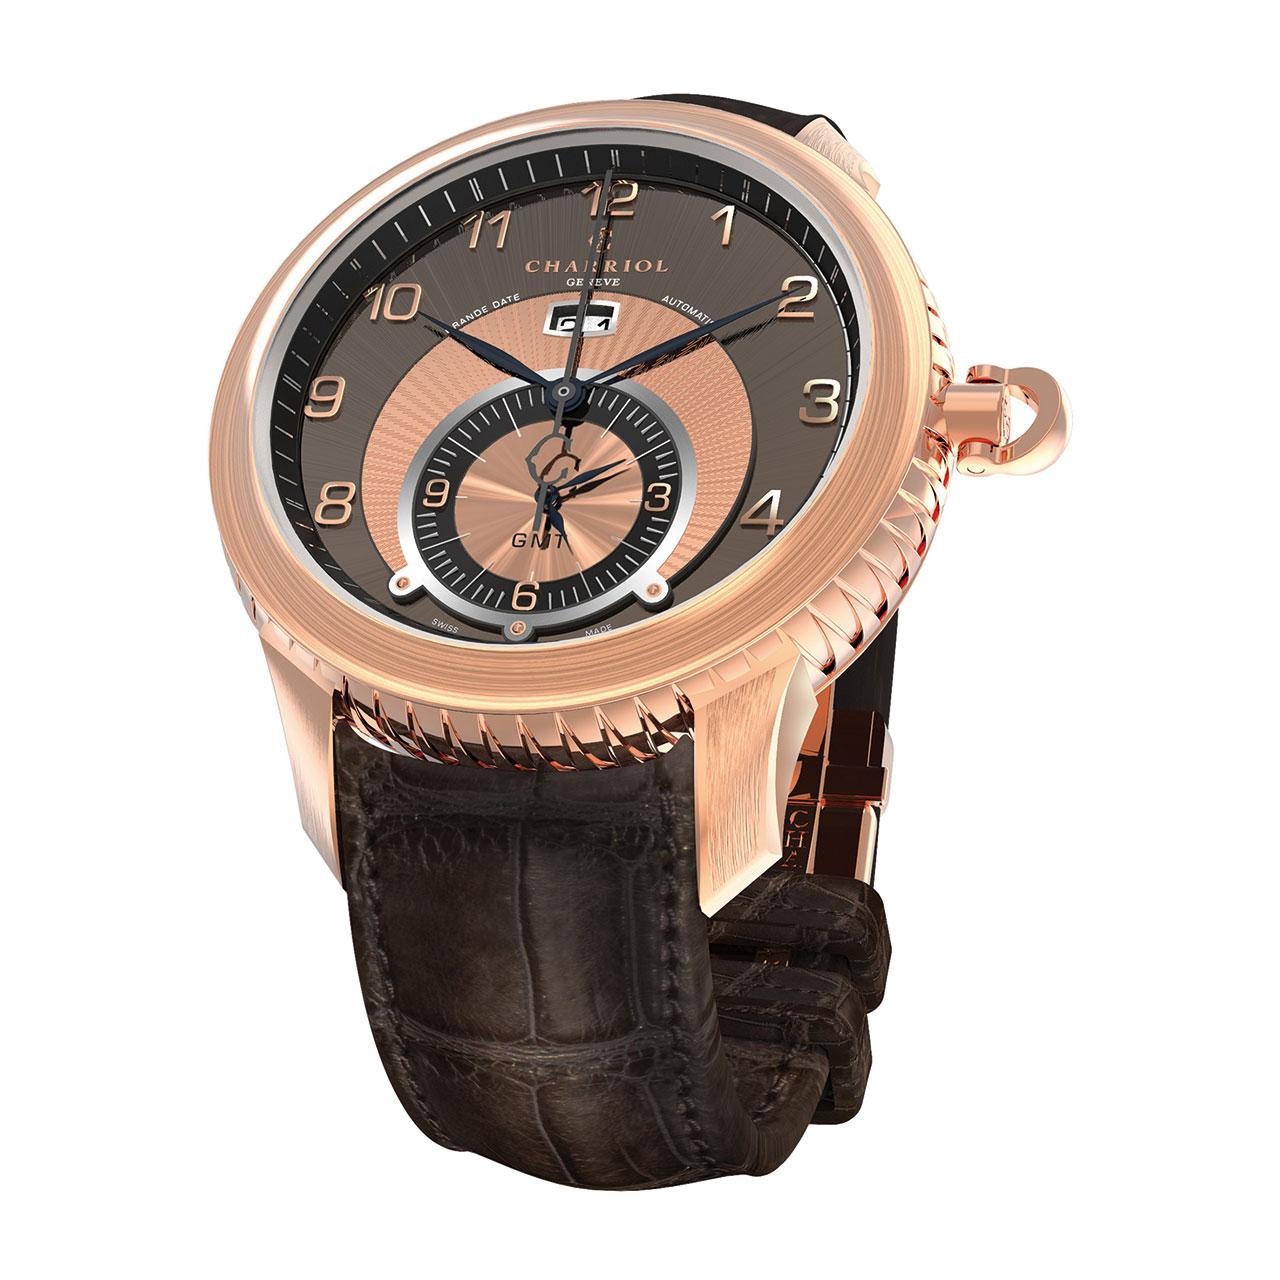 Charriol Colvmbvs™ Grande Date GMT Watch